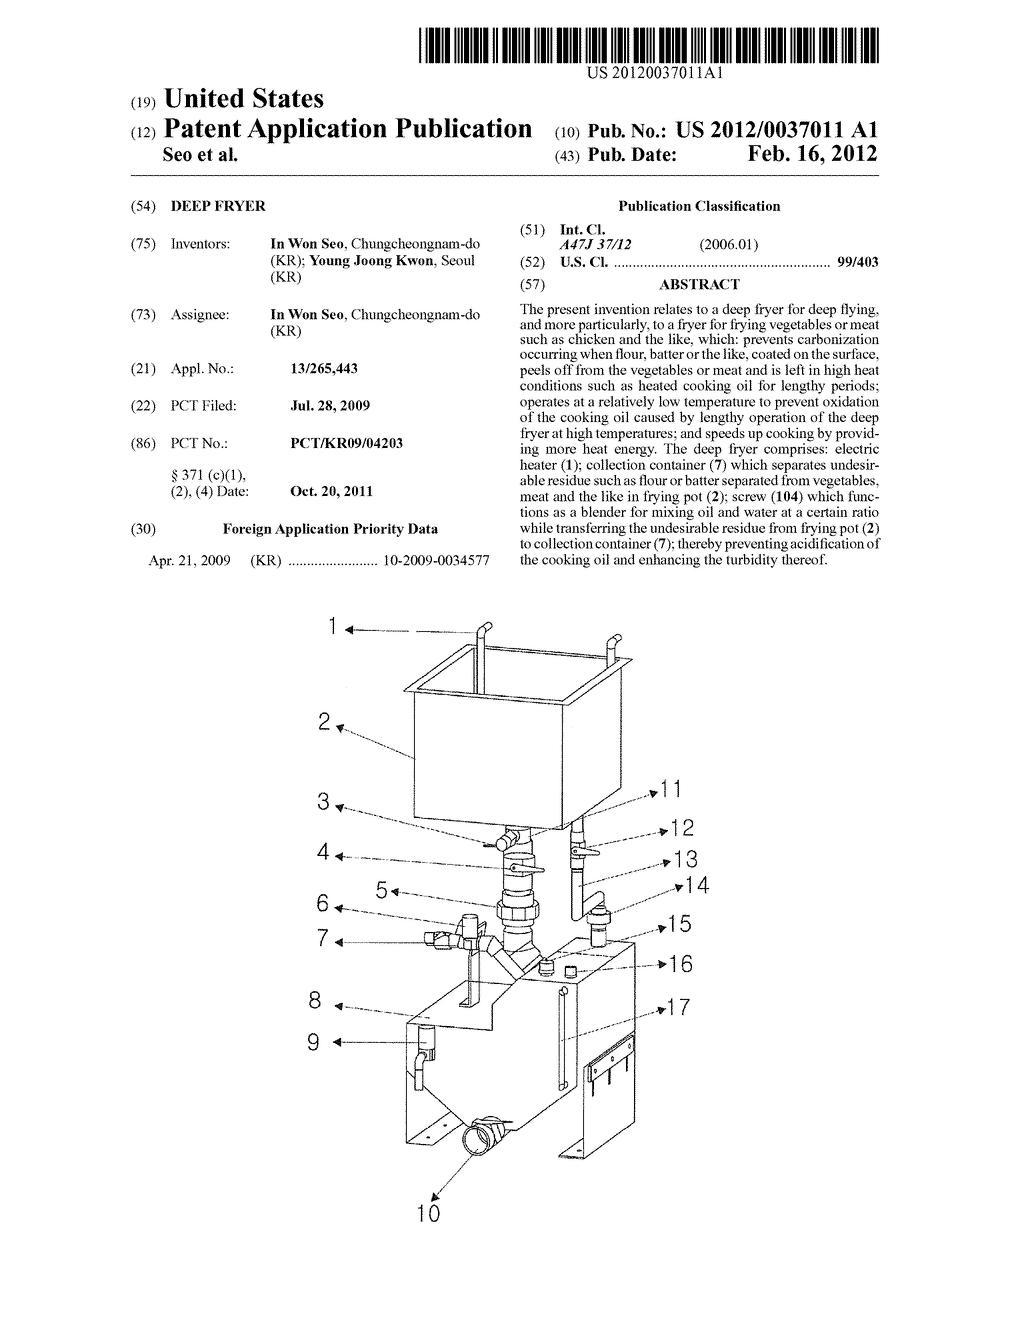 Deep Fryer Diagram Wiring Data Clavioline Concert Model Tone Generator Schematic And Image 01 Rh Patentsencyclopedia Com Fat Commercial